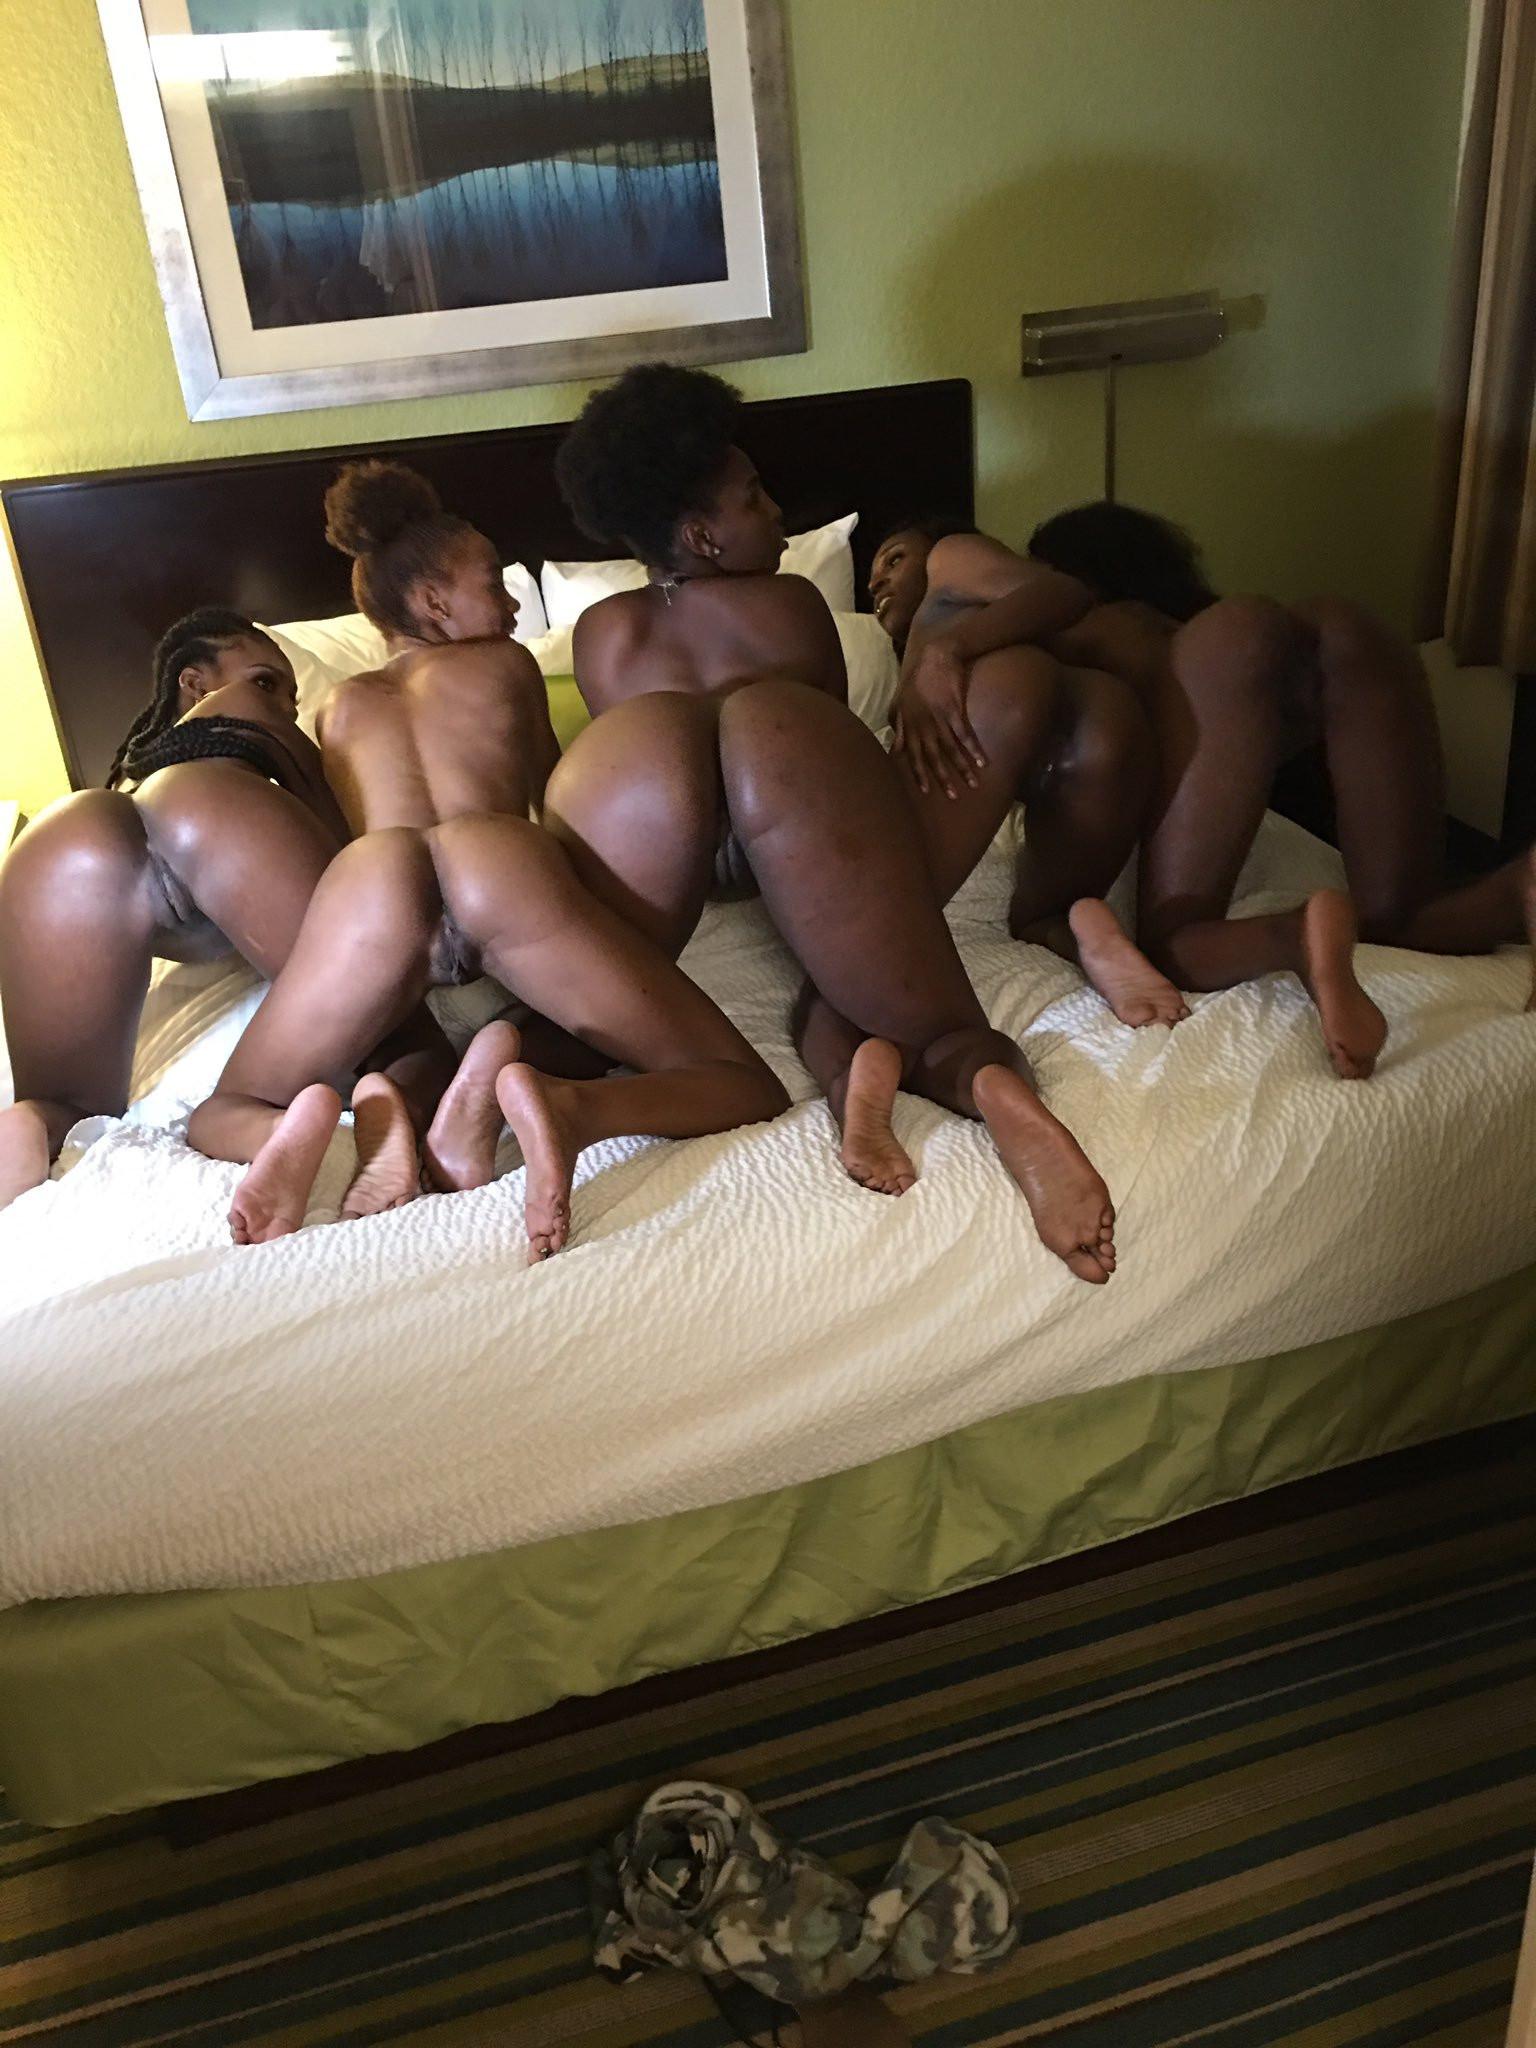 wife lapdancing for friend free porn tube watch #ebony#amateur#group#lineup#asses#onbed#posingnude#waitingformaster#slutscompetingforattention#ebonysluts#blackgirl#doggyready#analready#ass